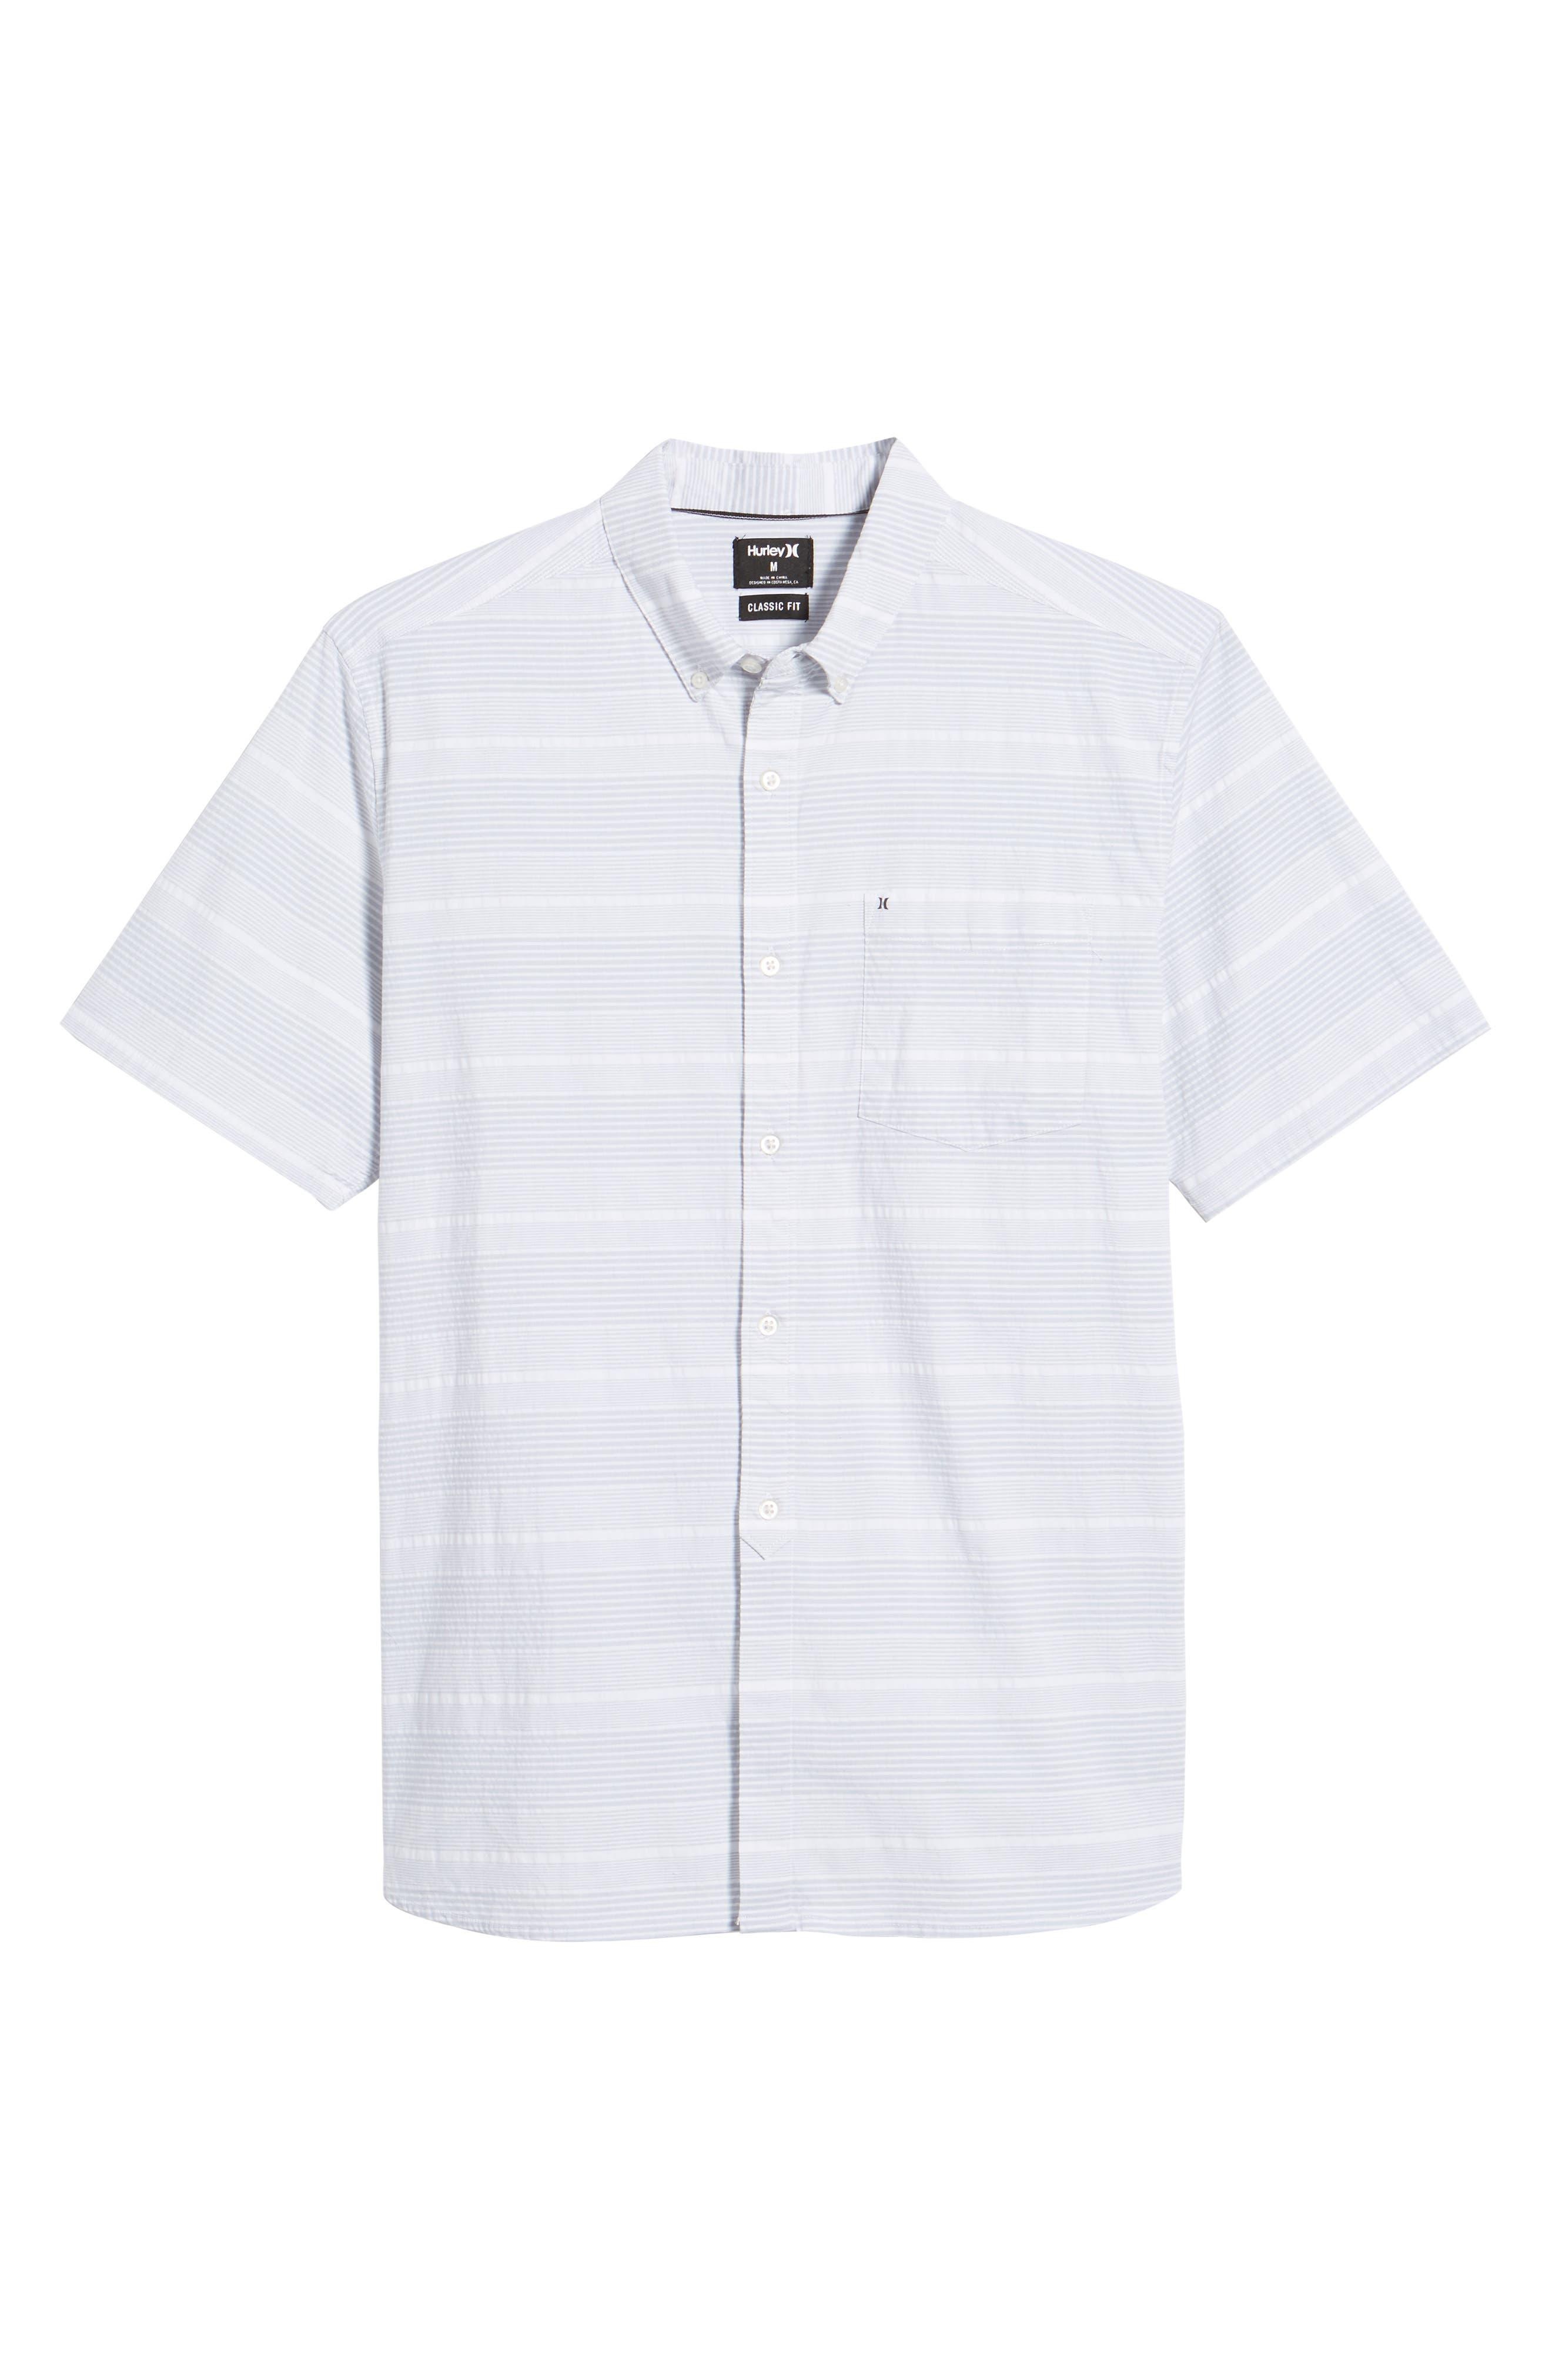 Surplus Short Sleeve Shirt,                             Alternate thumbnail 11, color,